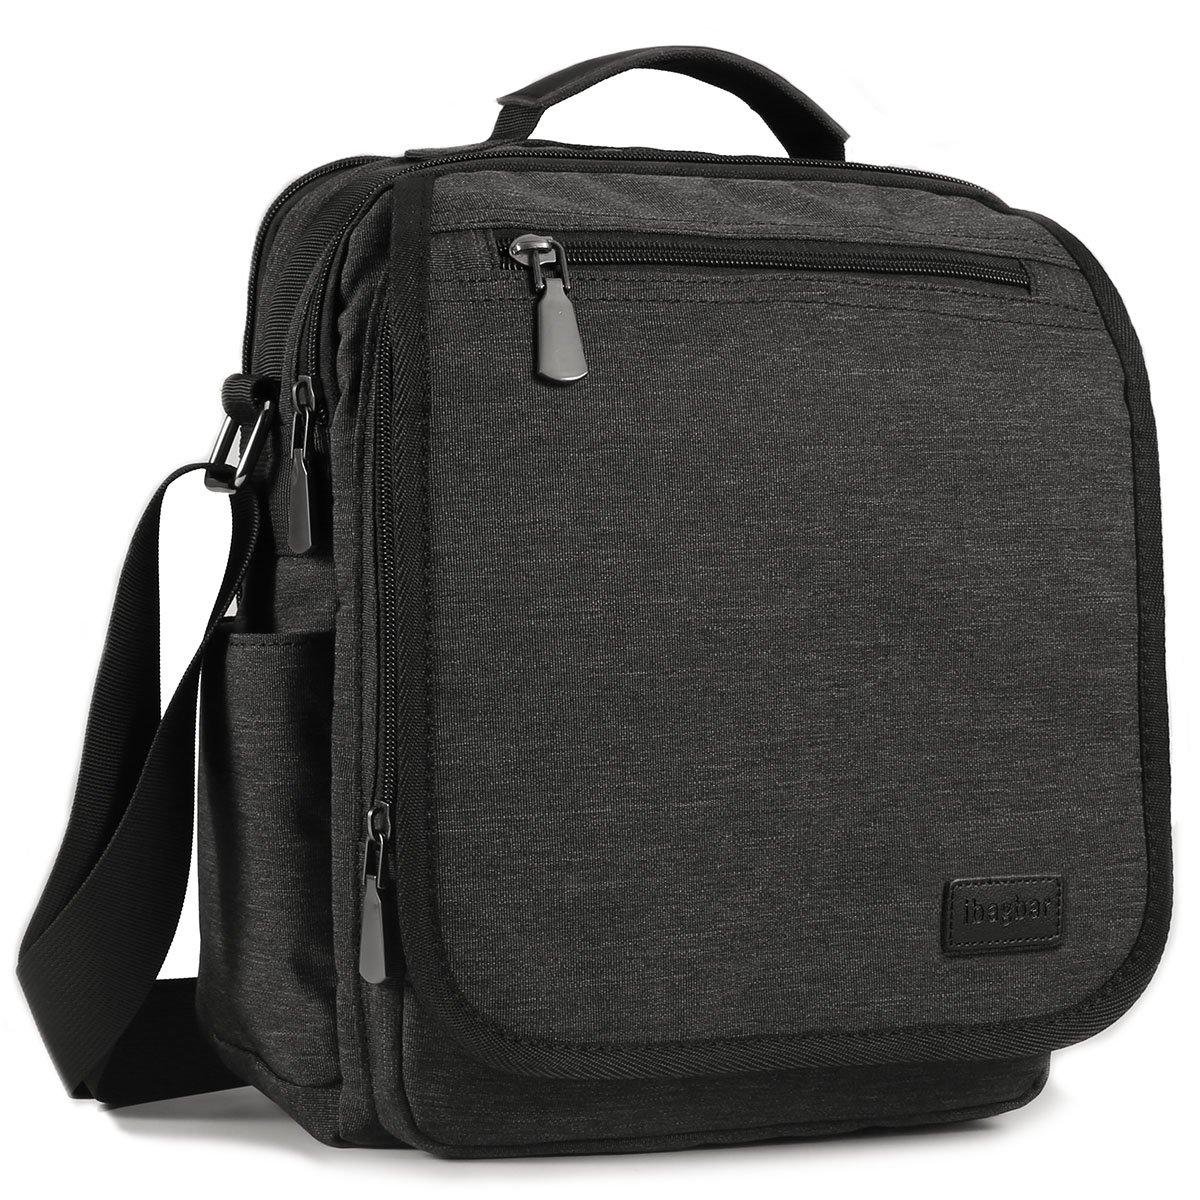 Ibagbar Small Messenger Bag Shoulder Crossbody Work